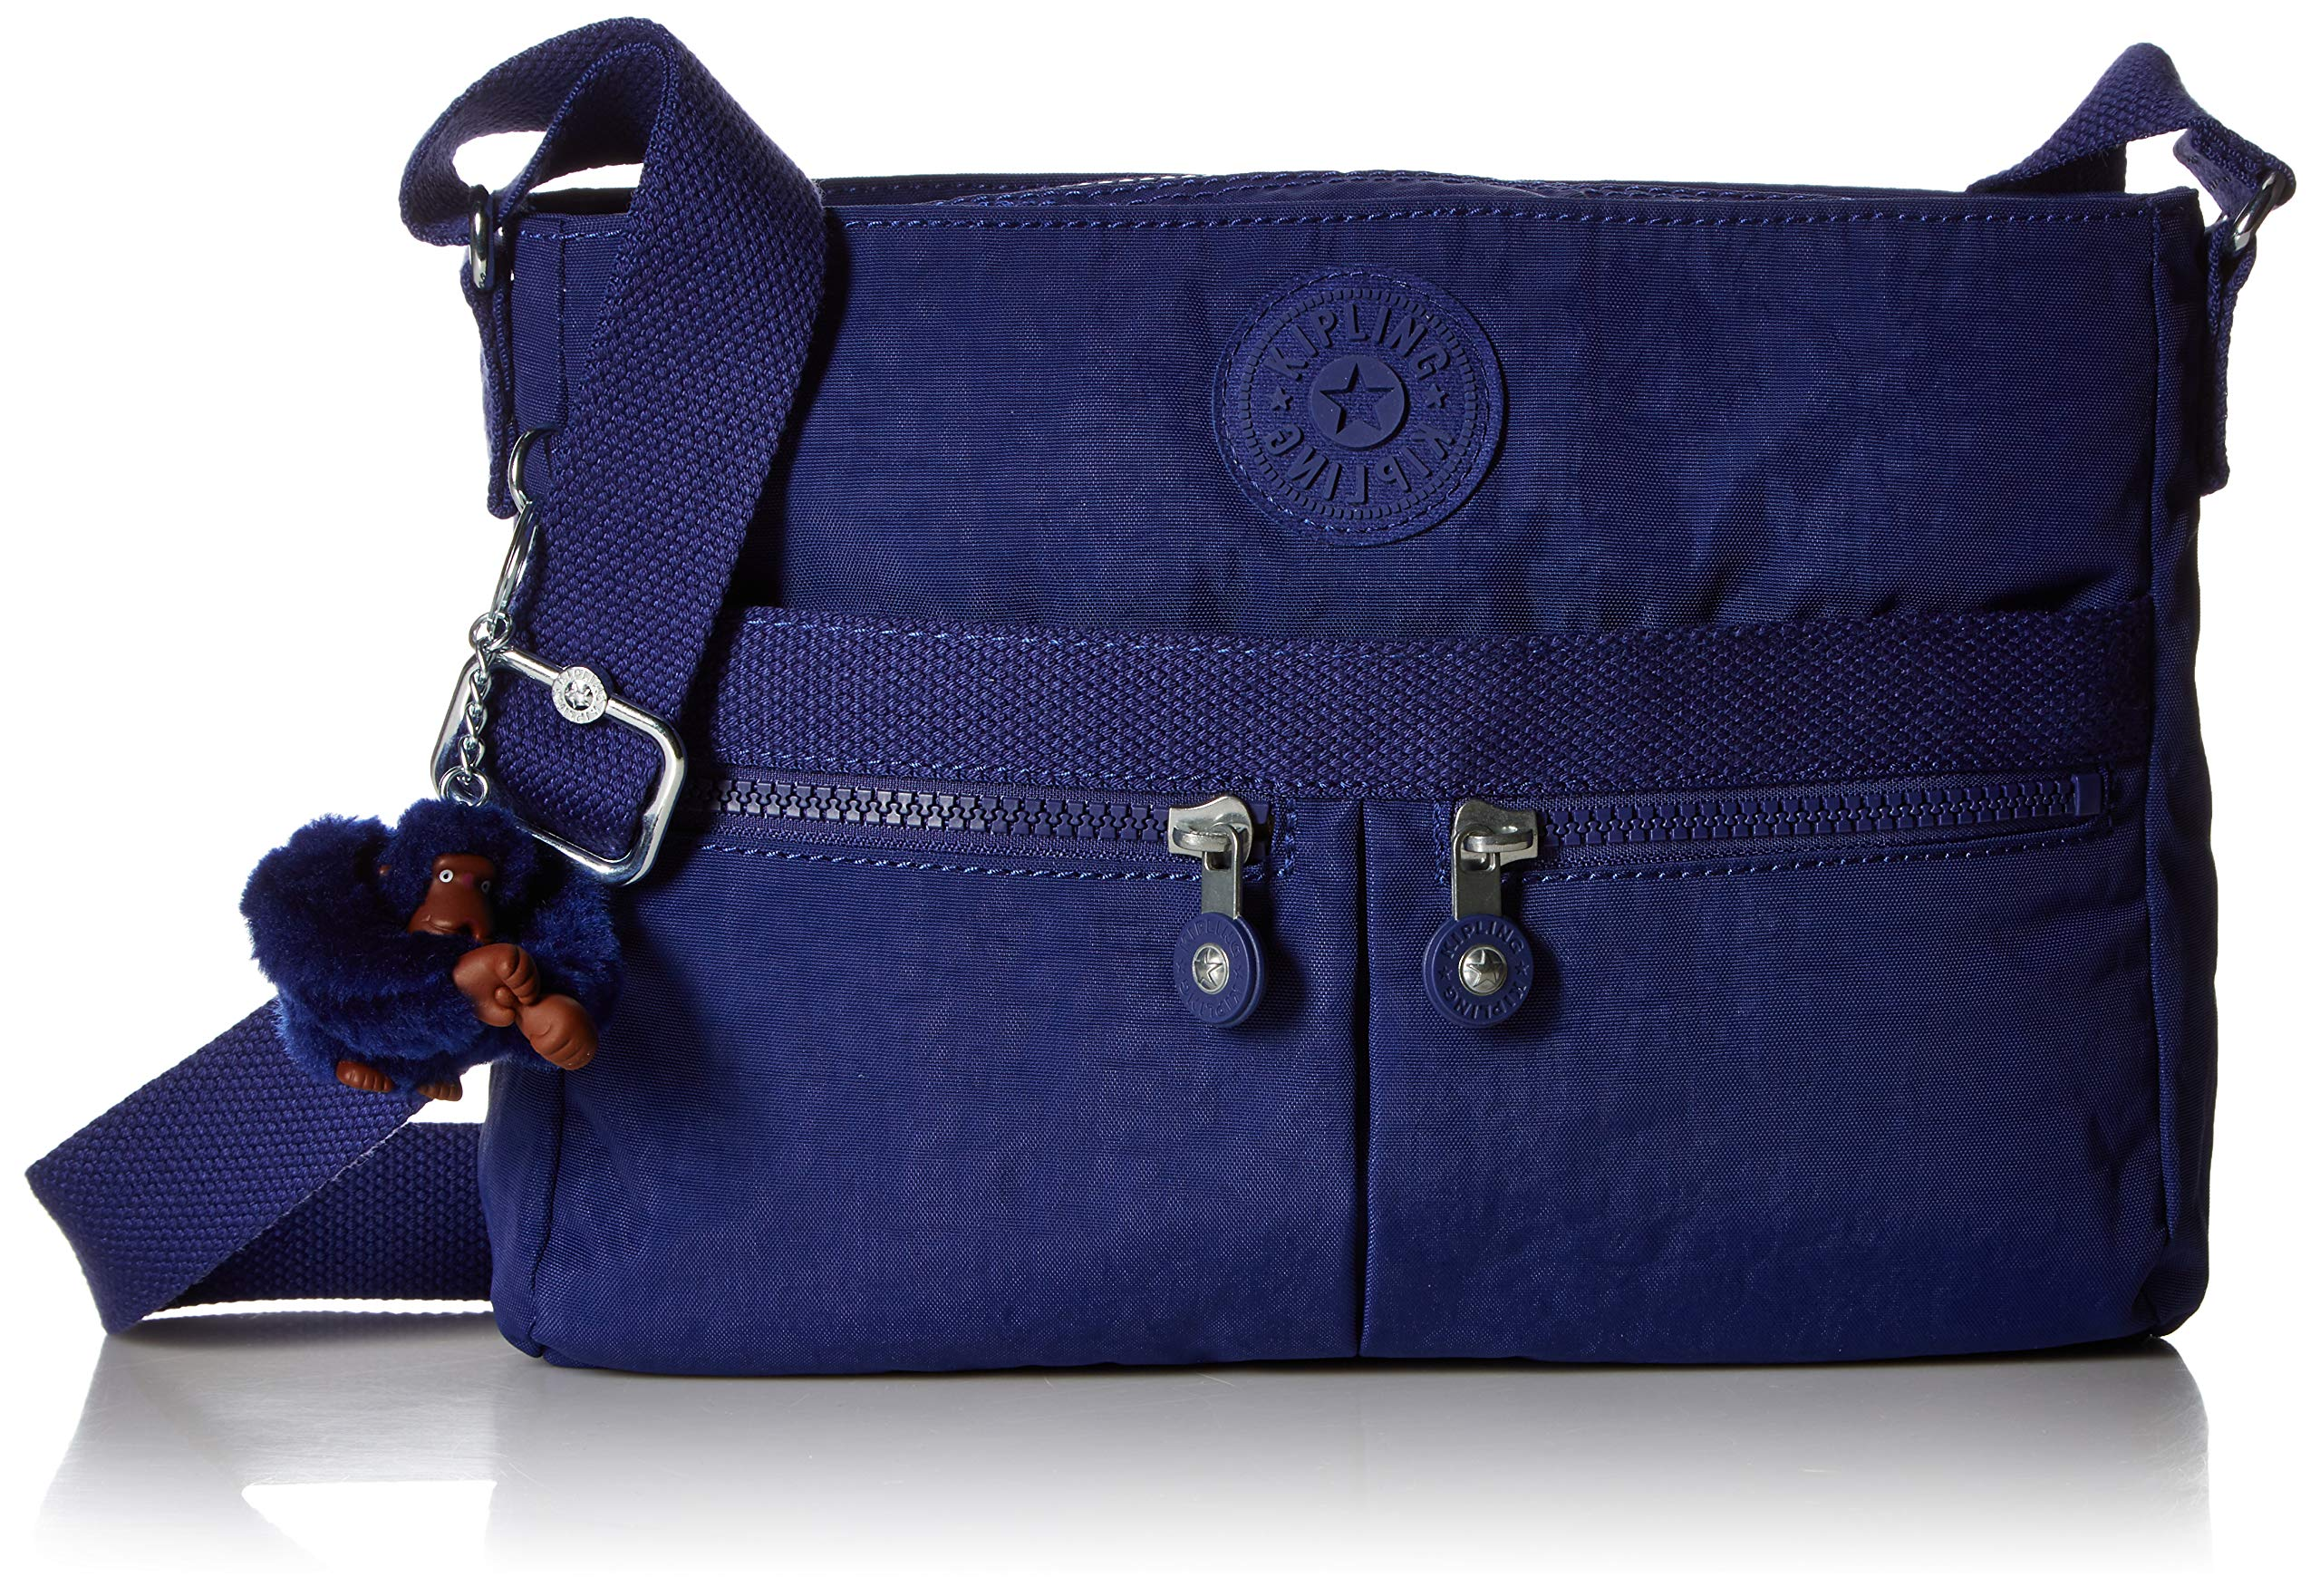 Kipling Women's Angie Crossbody Bag, Adjustable Shoulder Strap, Zip Closure, Cobalt Dream Tonal